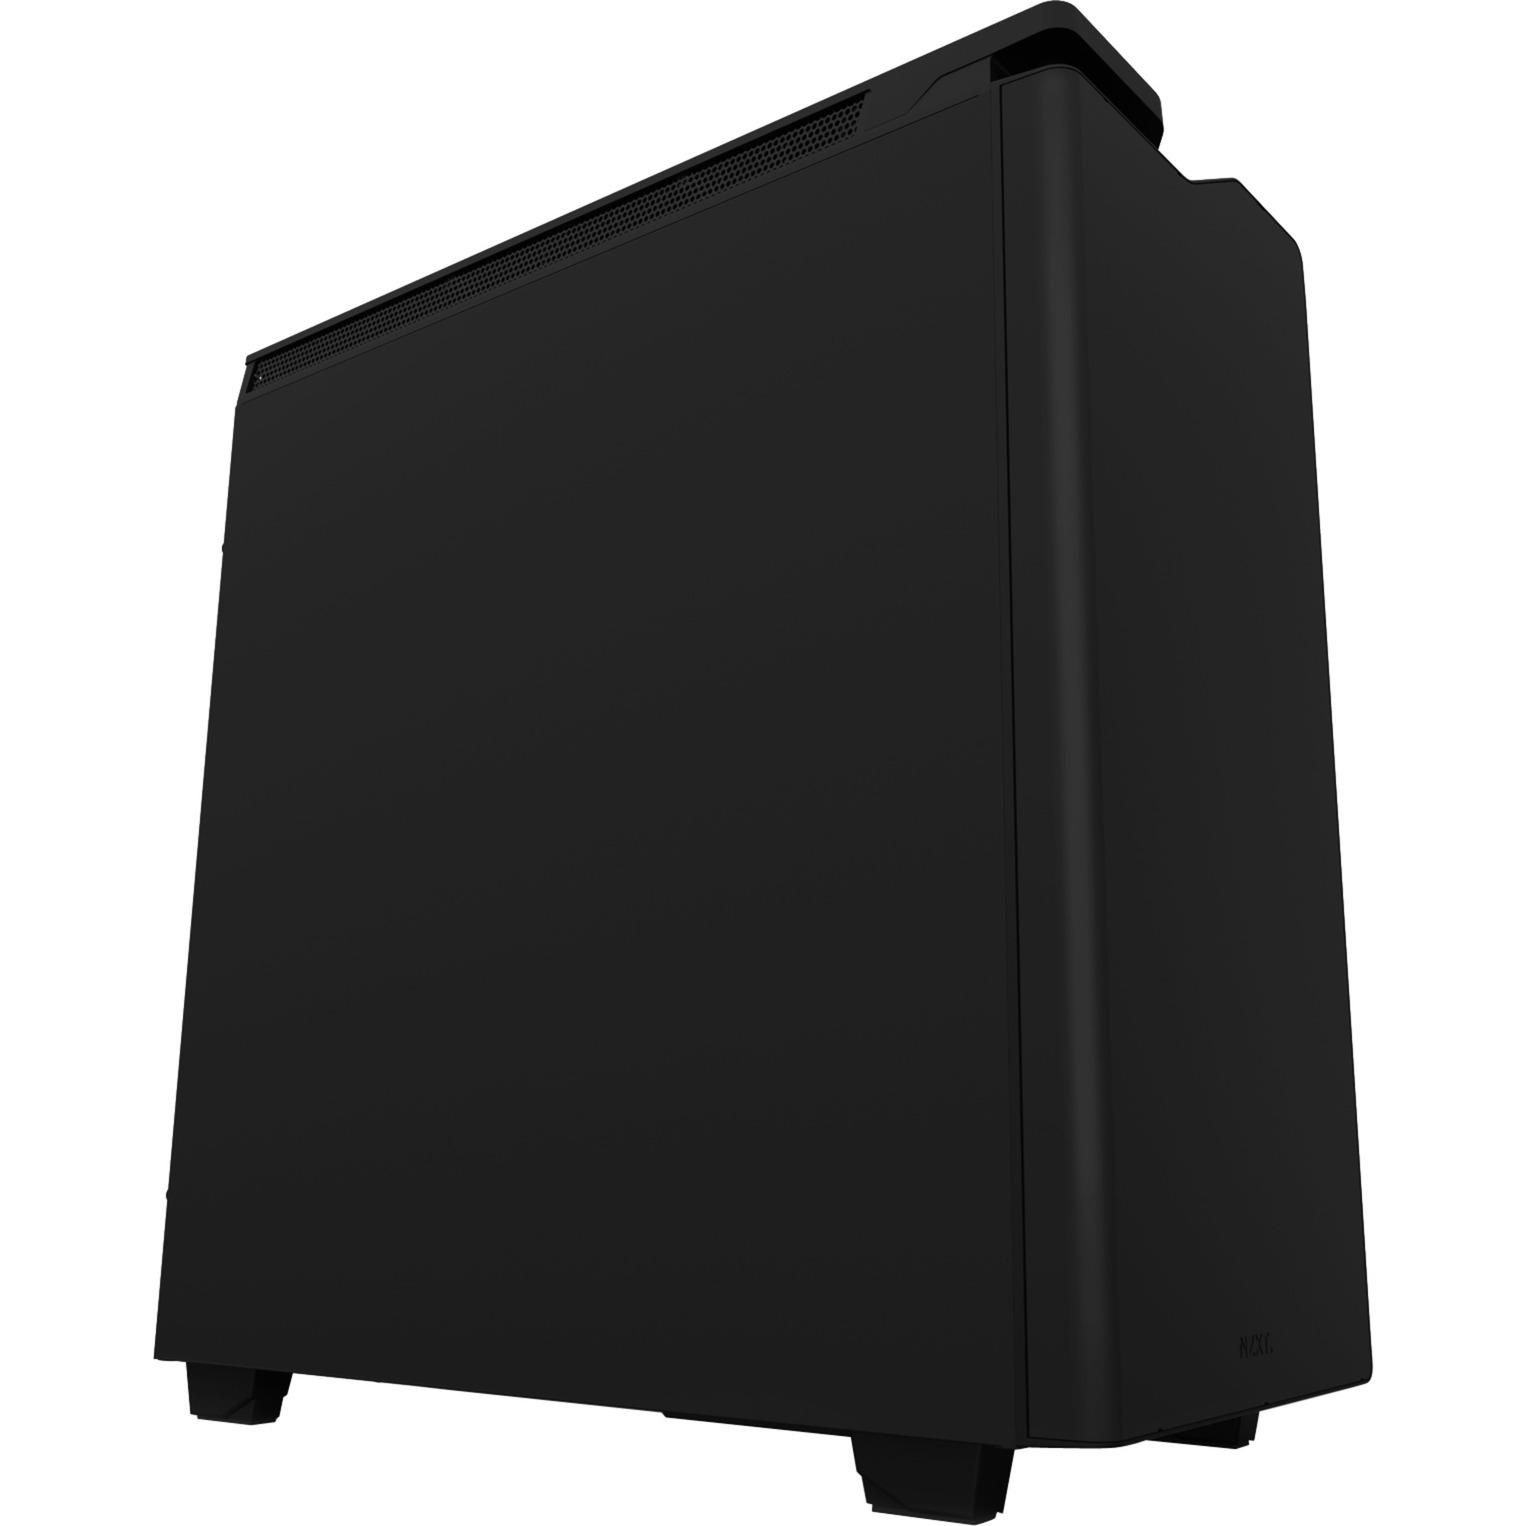 CA-H442C-M8 carcasa de ordenador Midi-Tower Negro, Cajas de torre